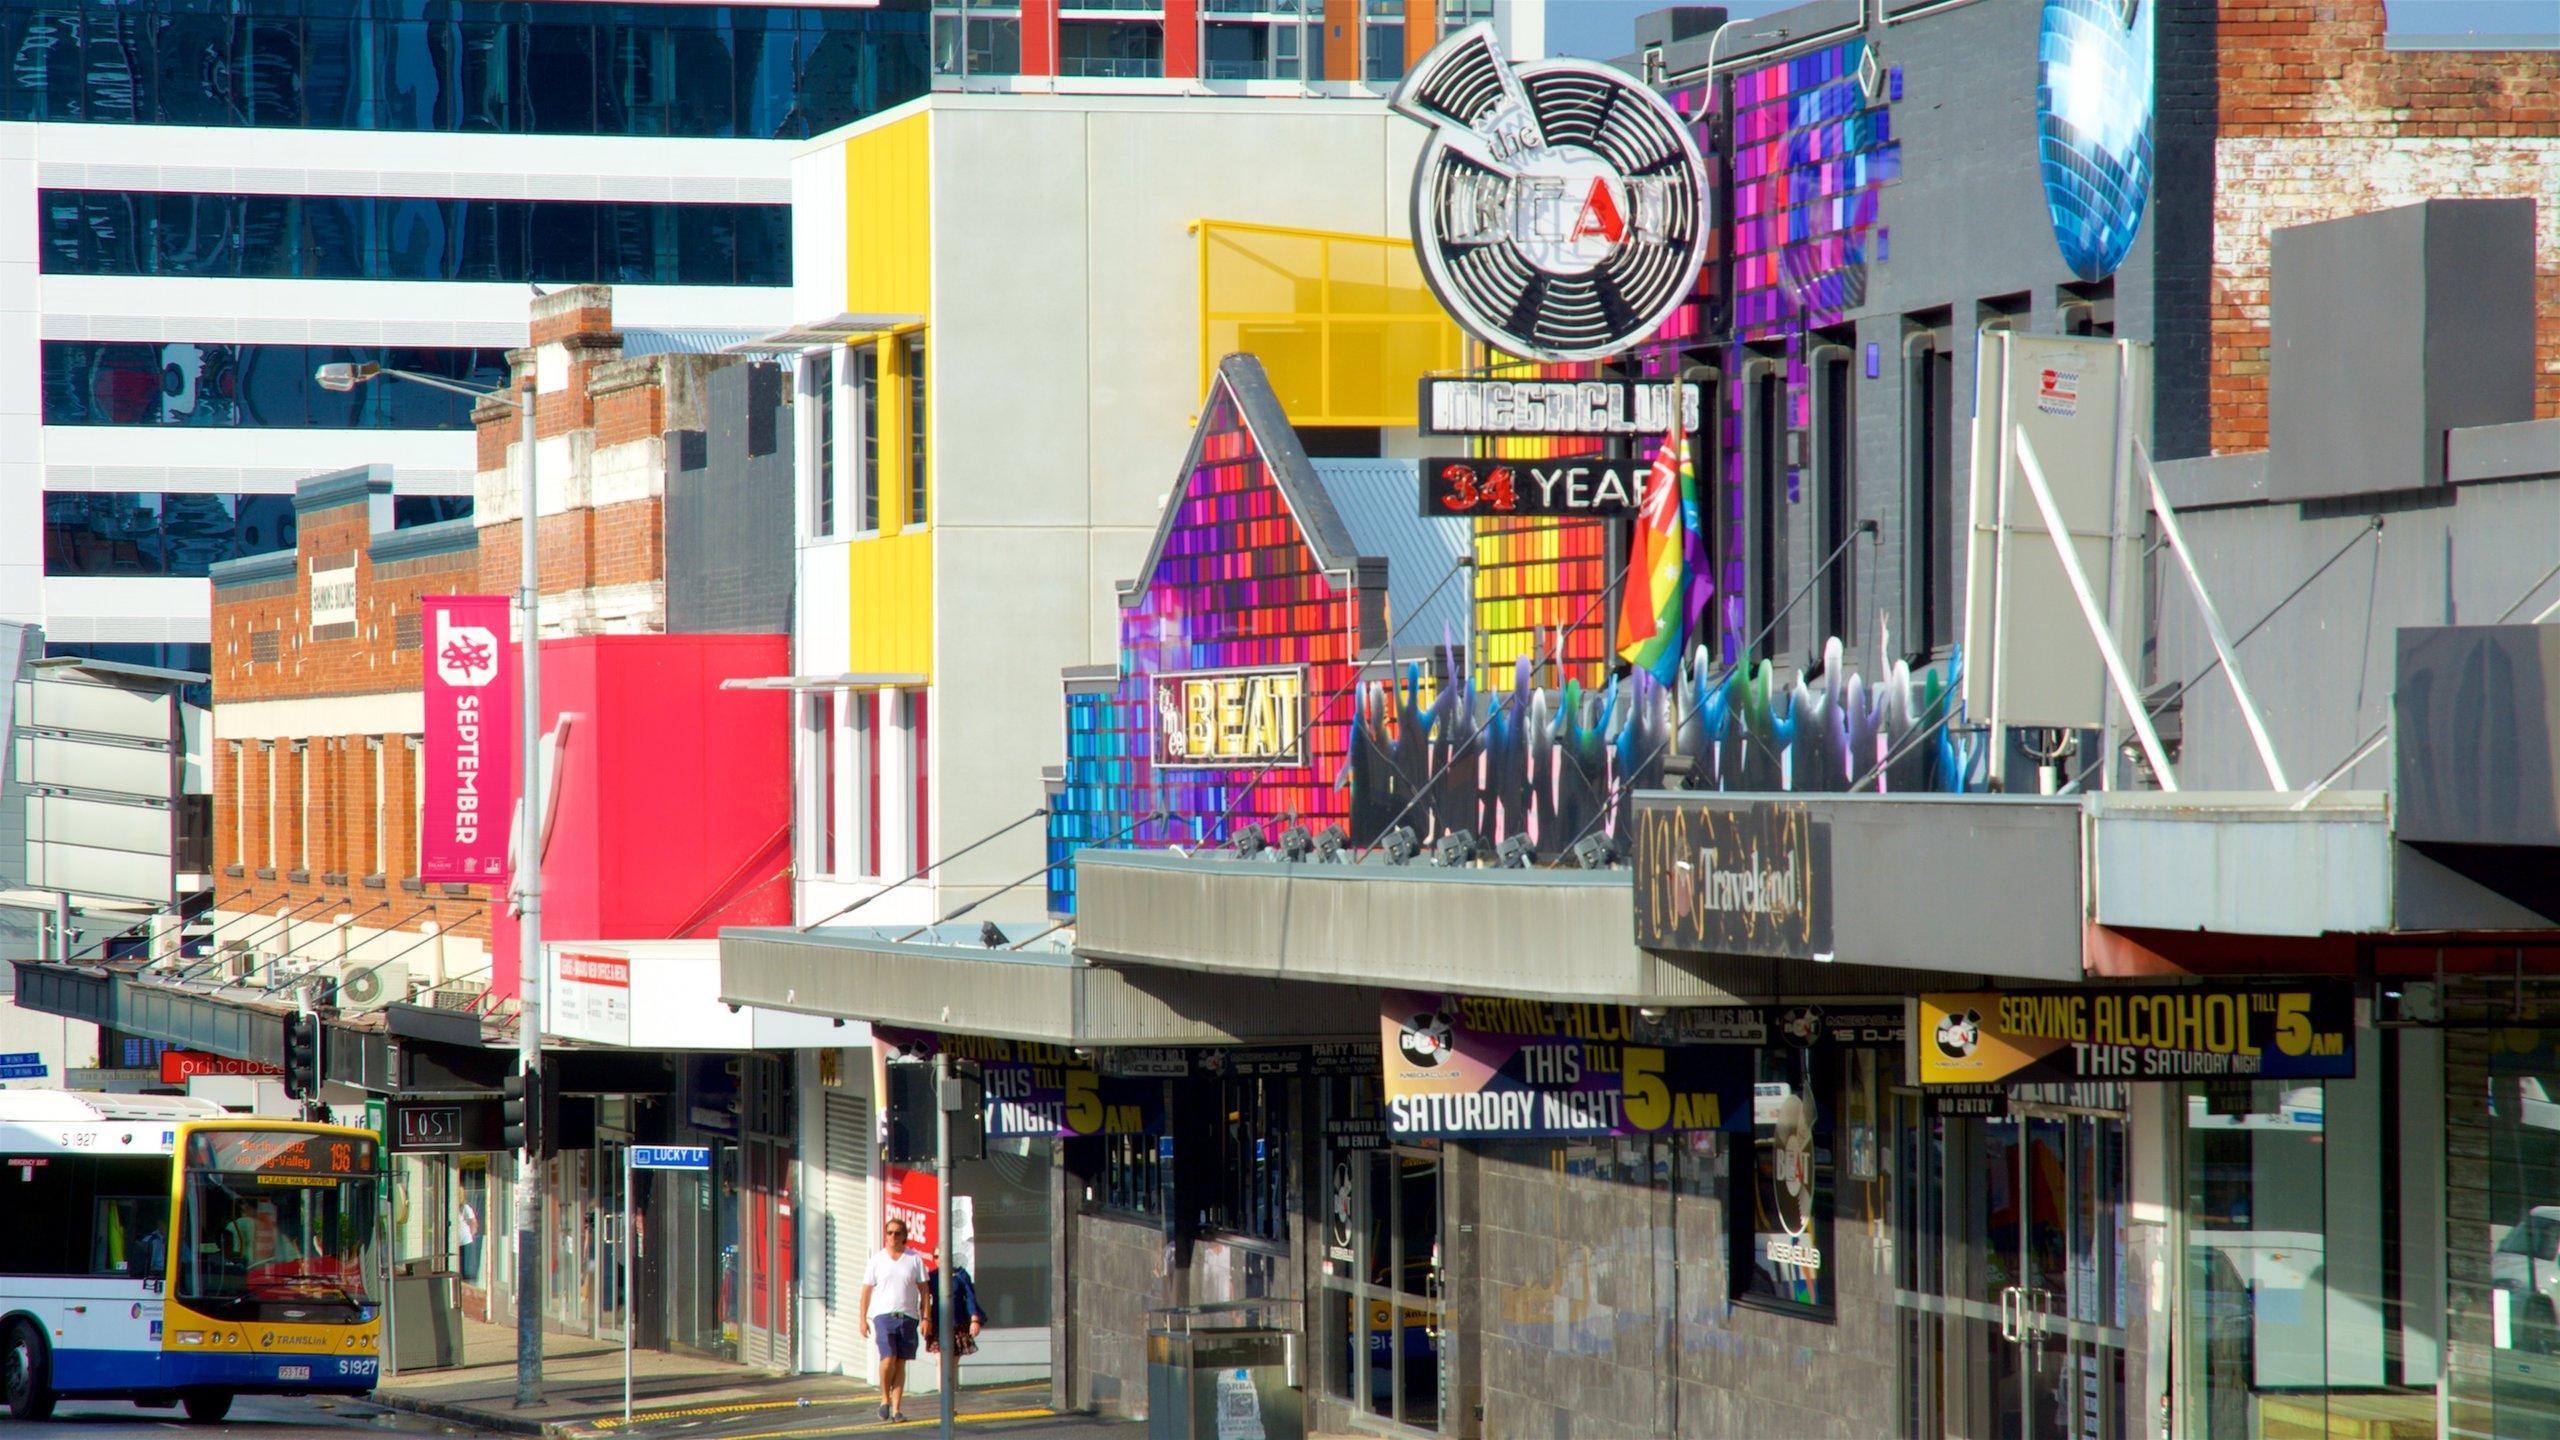 Fortitude Valley, Brisbane, Queensland, Australia